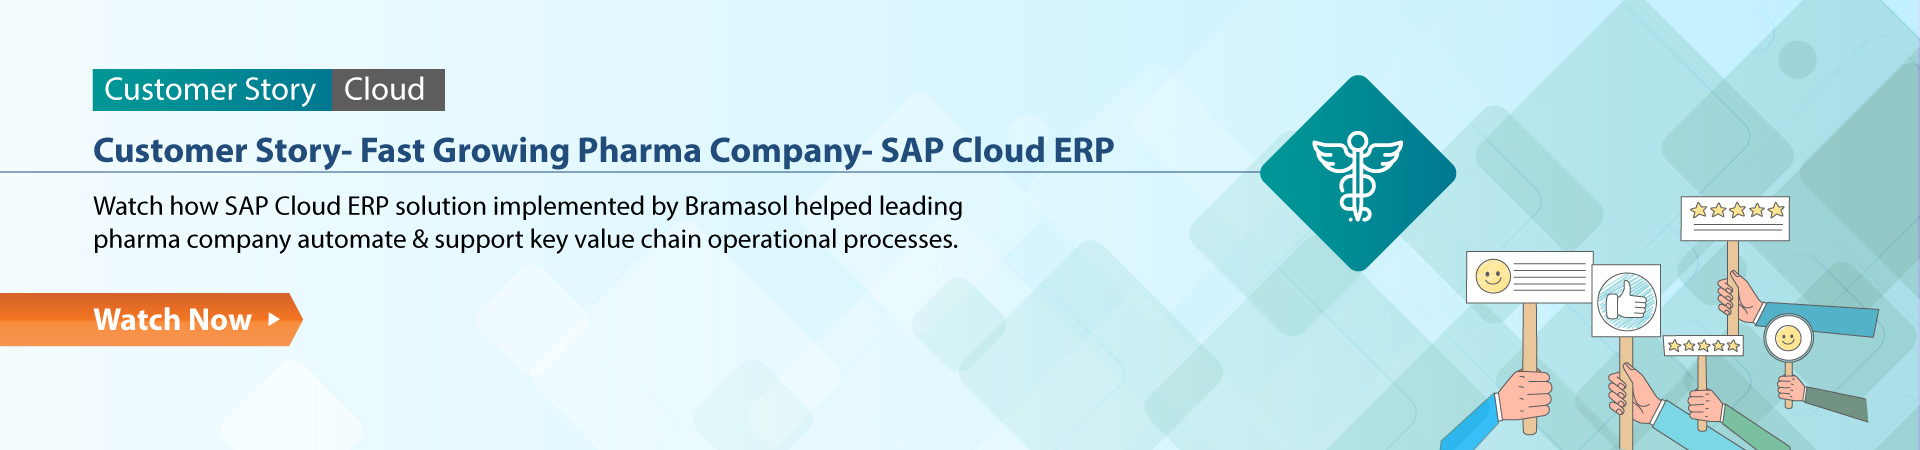 Fast Growing Pharma Company- SAP Cloud ERP Customer Story